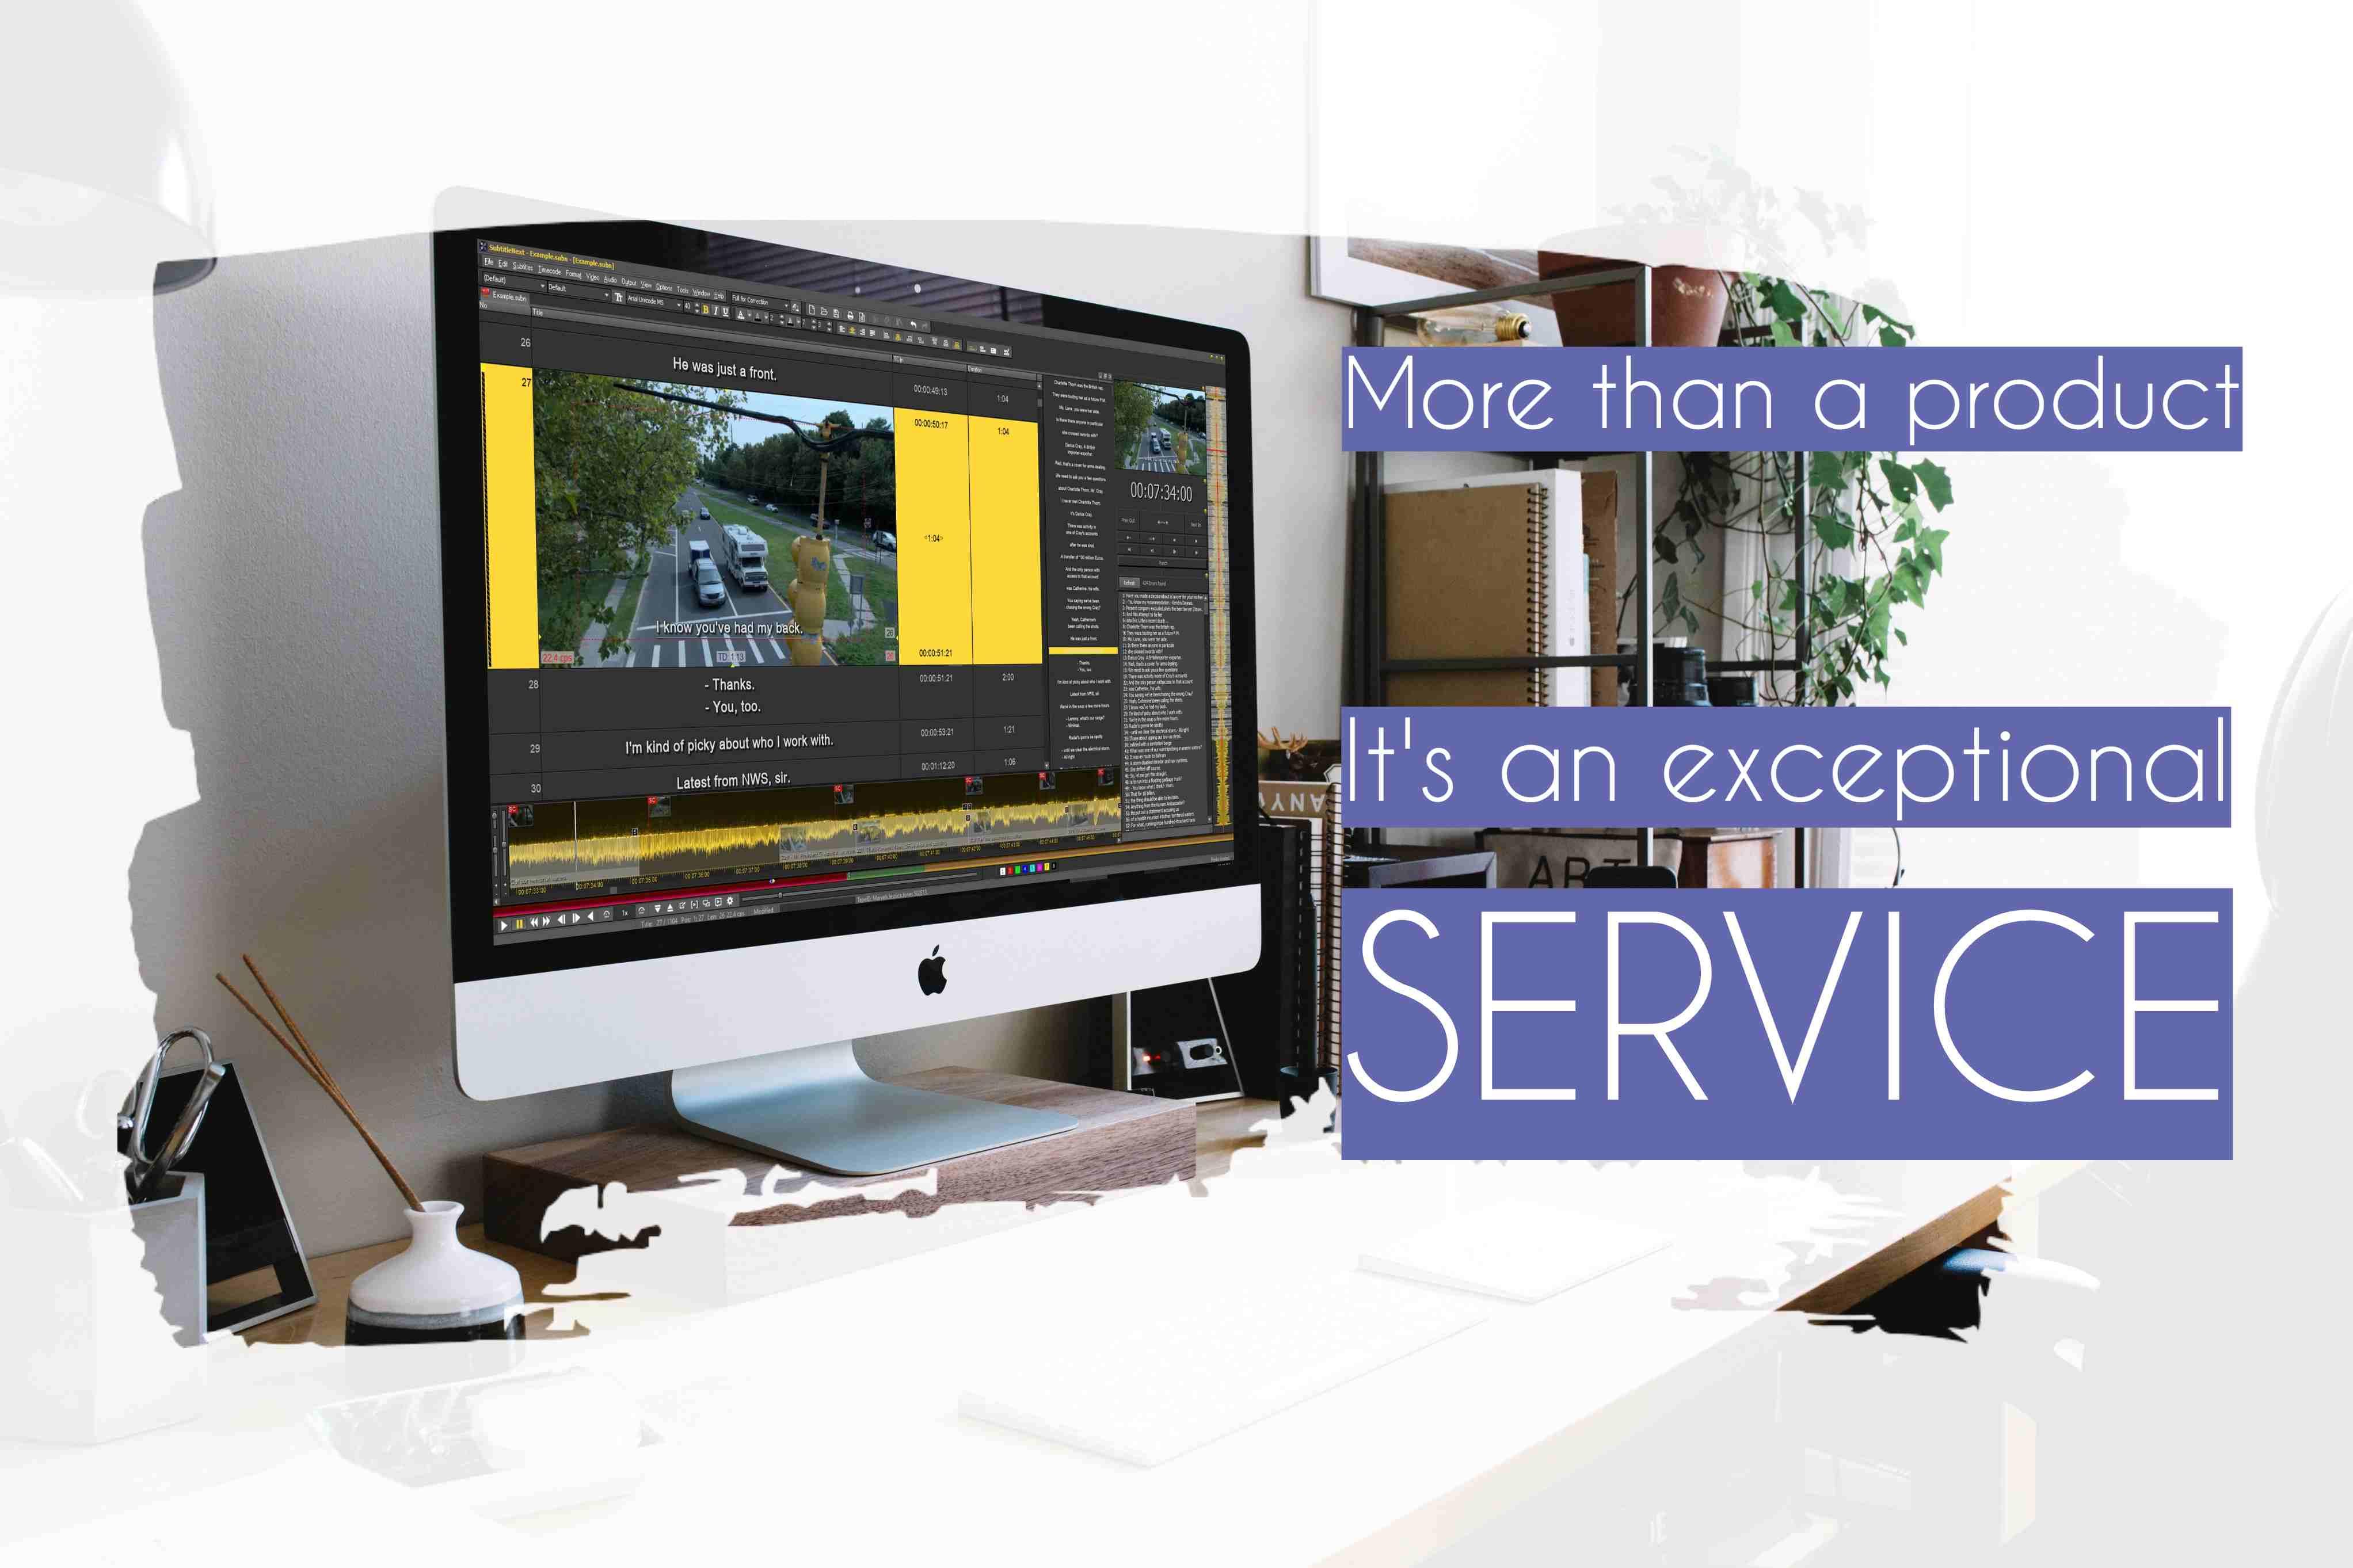 subtitling service